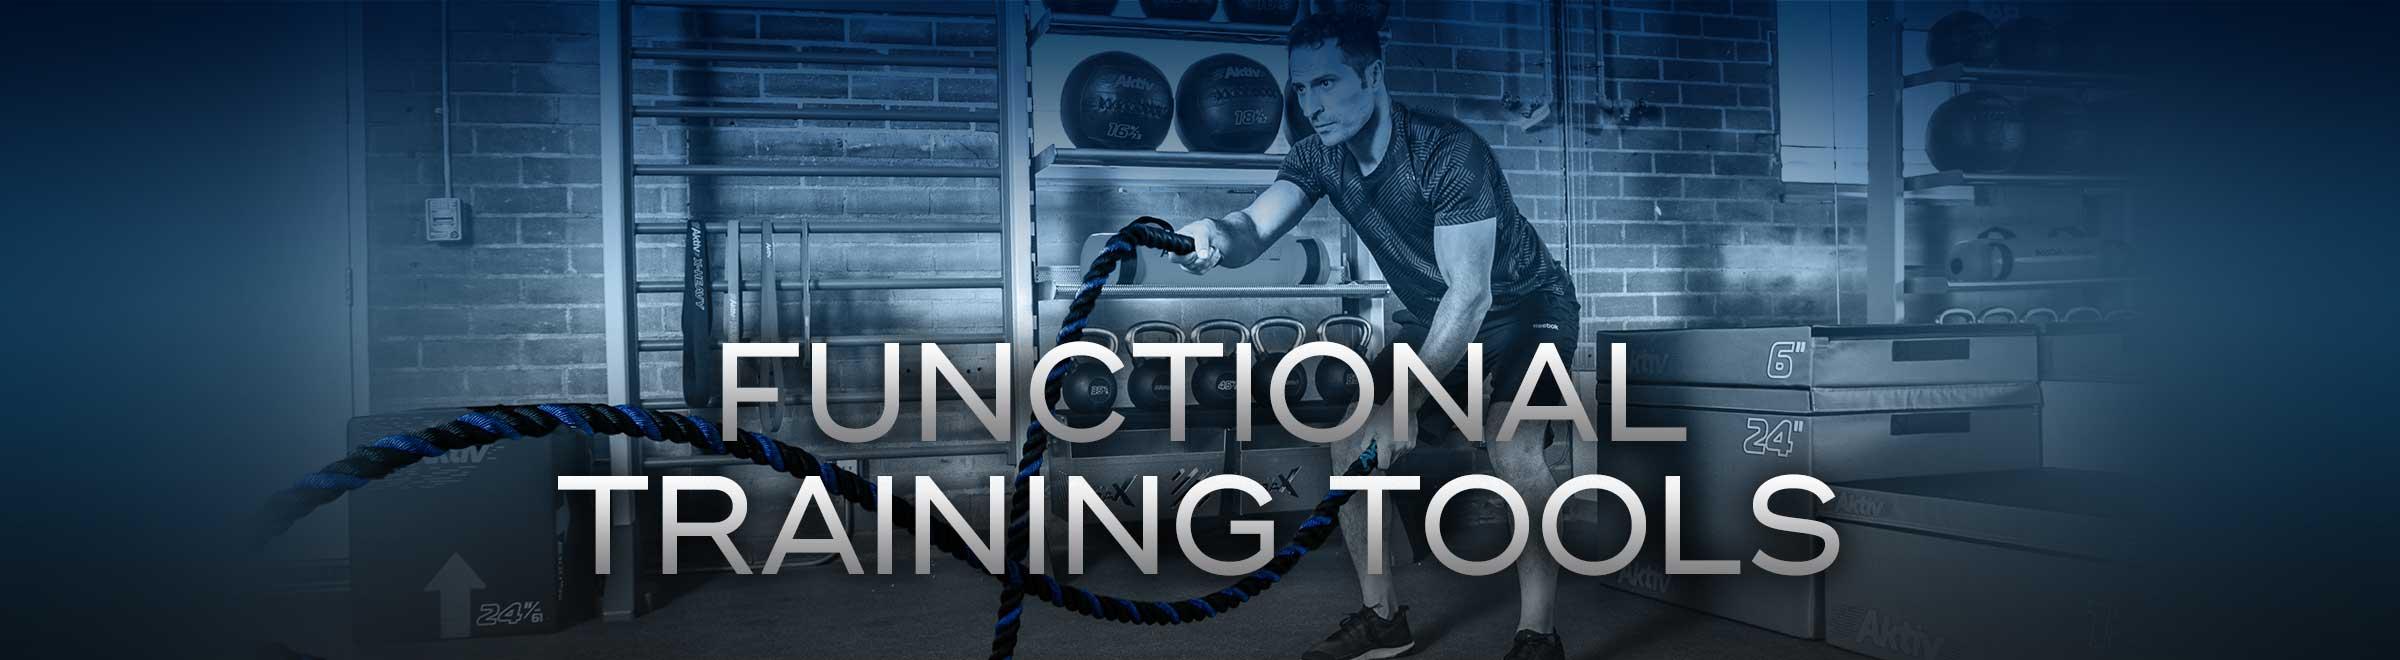 Functional Training Tools